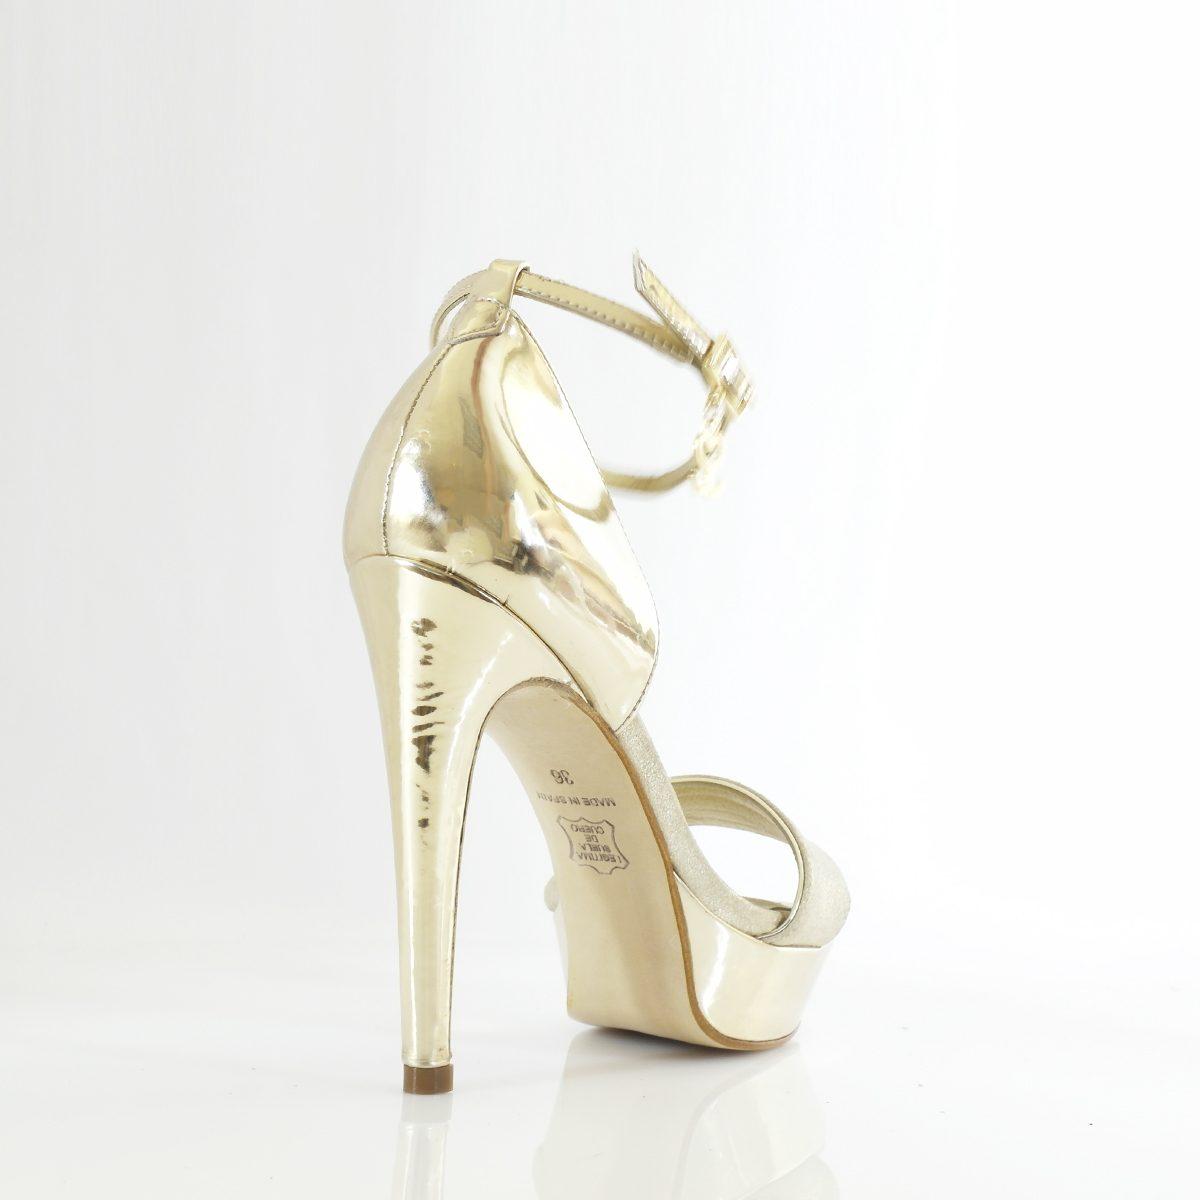 SANDALIA MOD.1378 (13cm) - zapatos personalizados fiesta